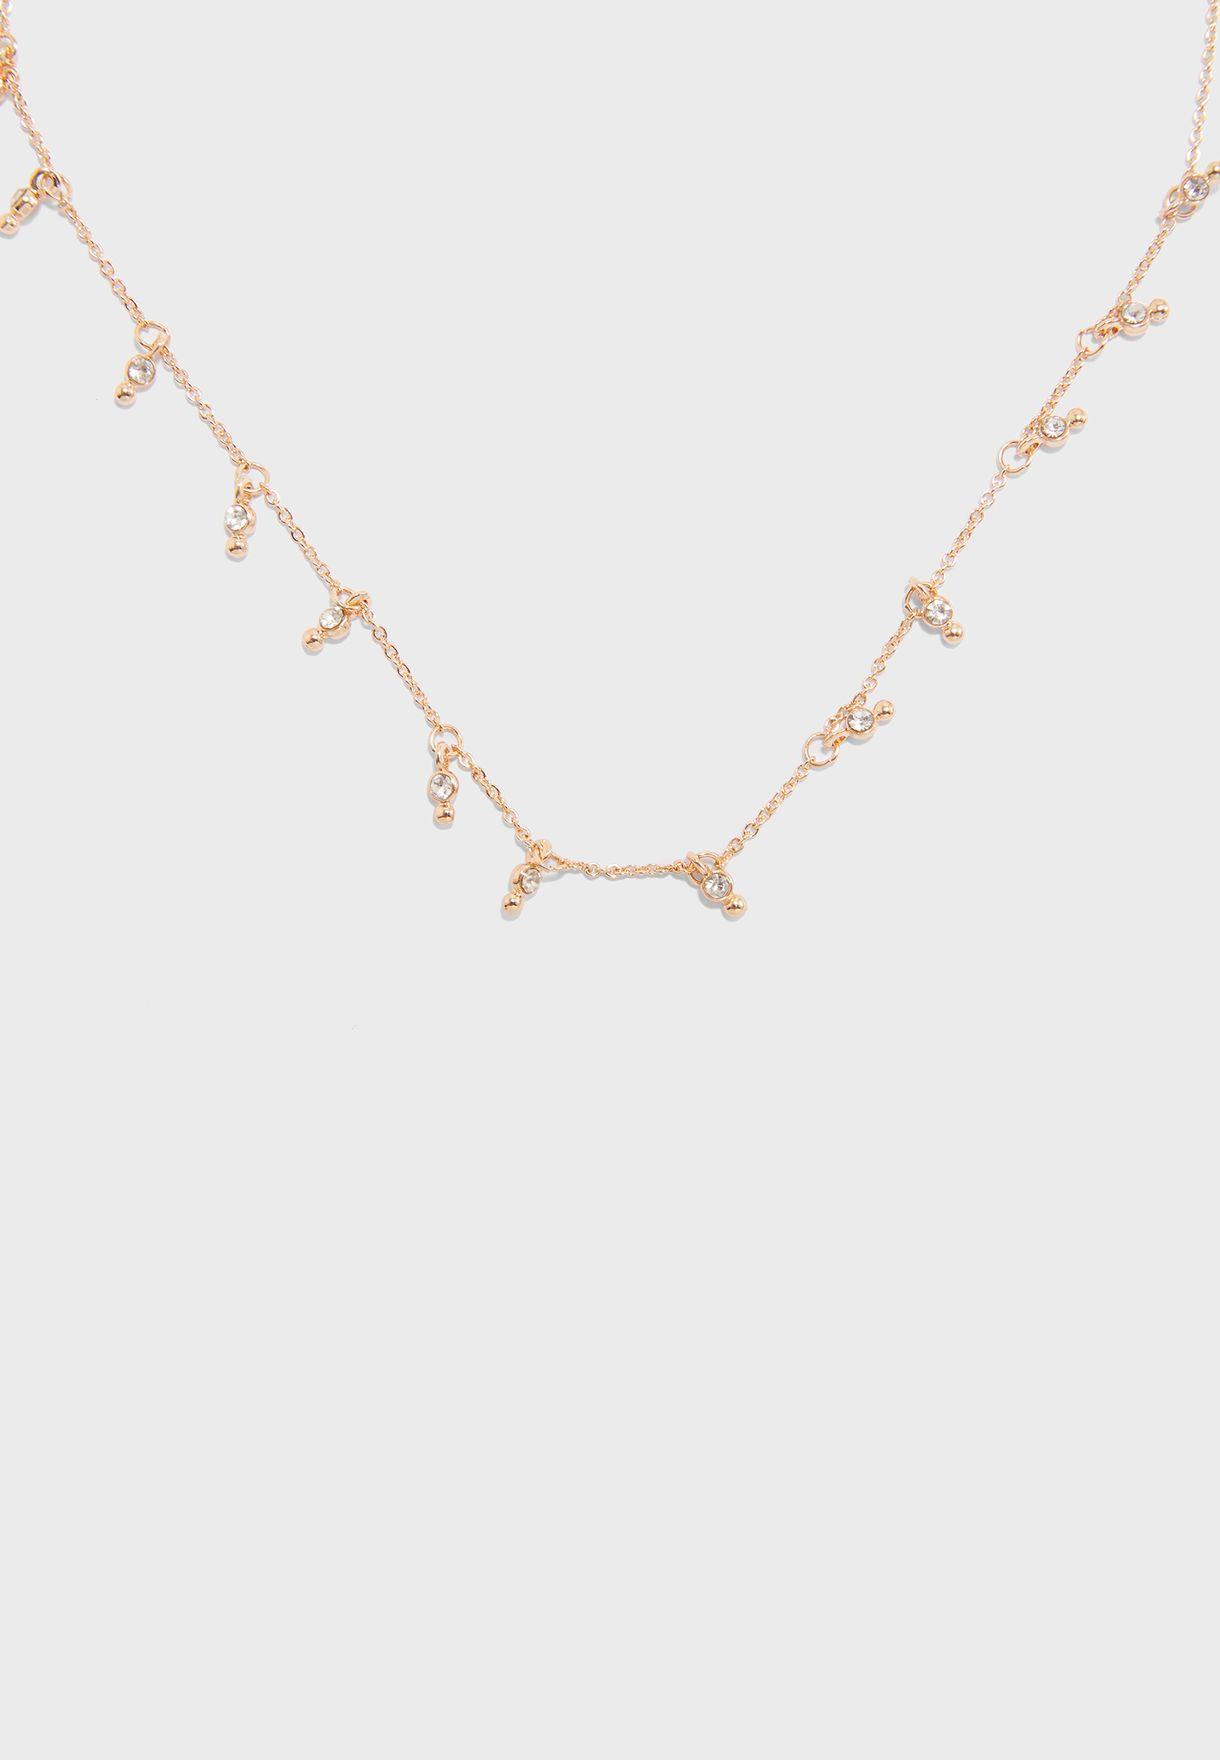 Dorominc Layered Necklace